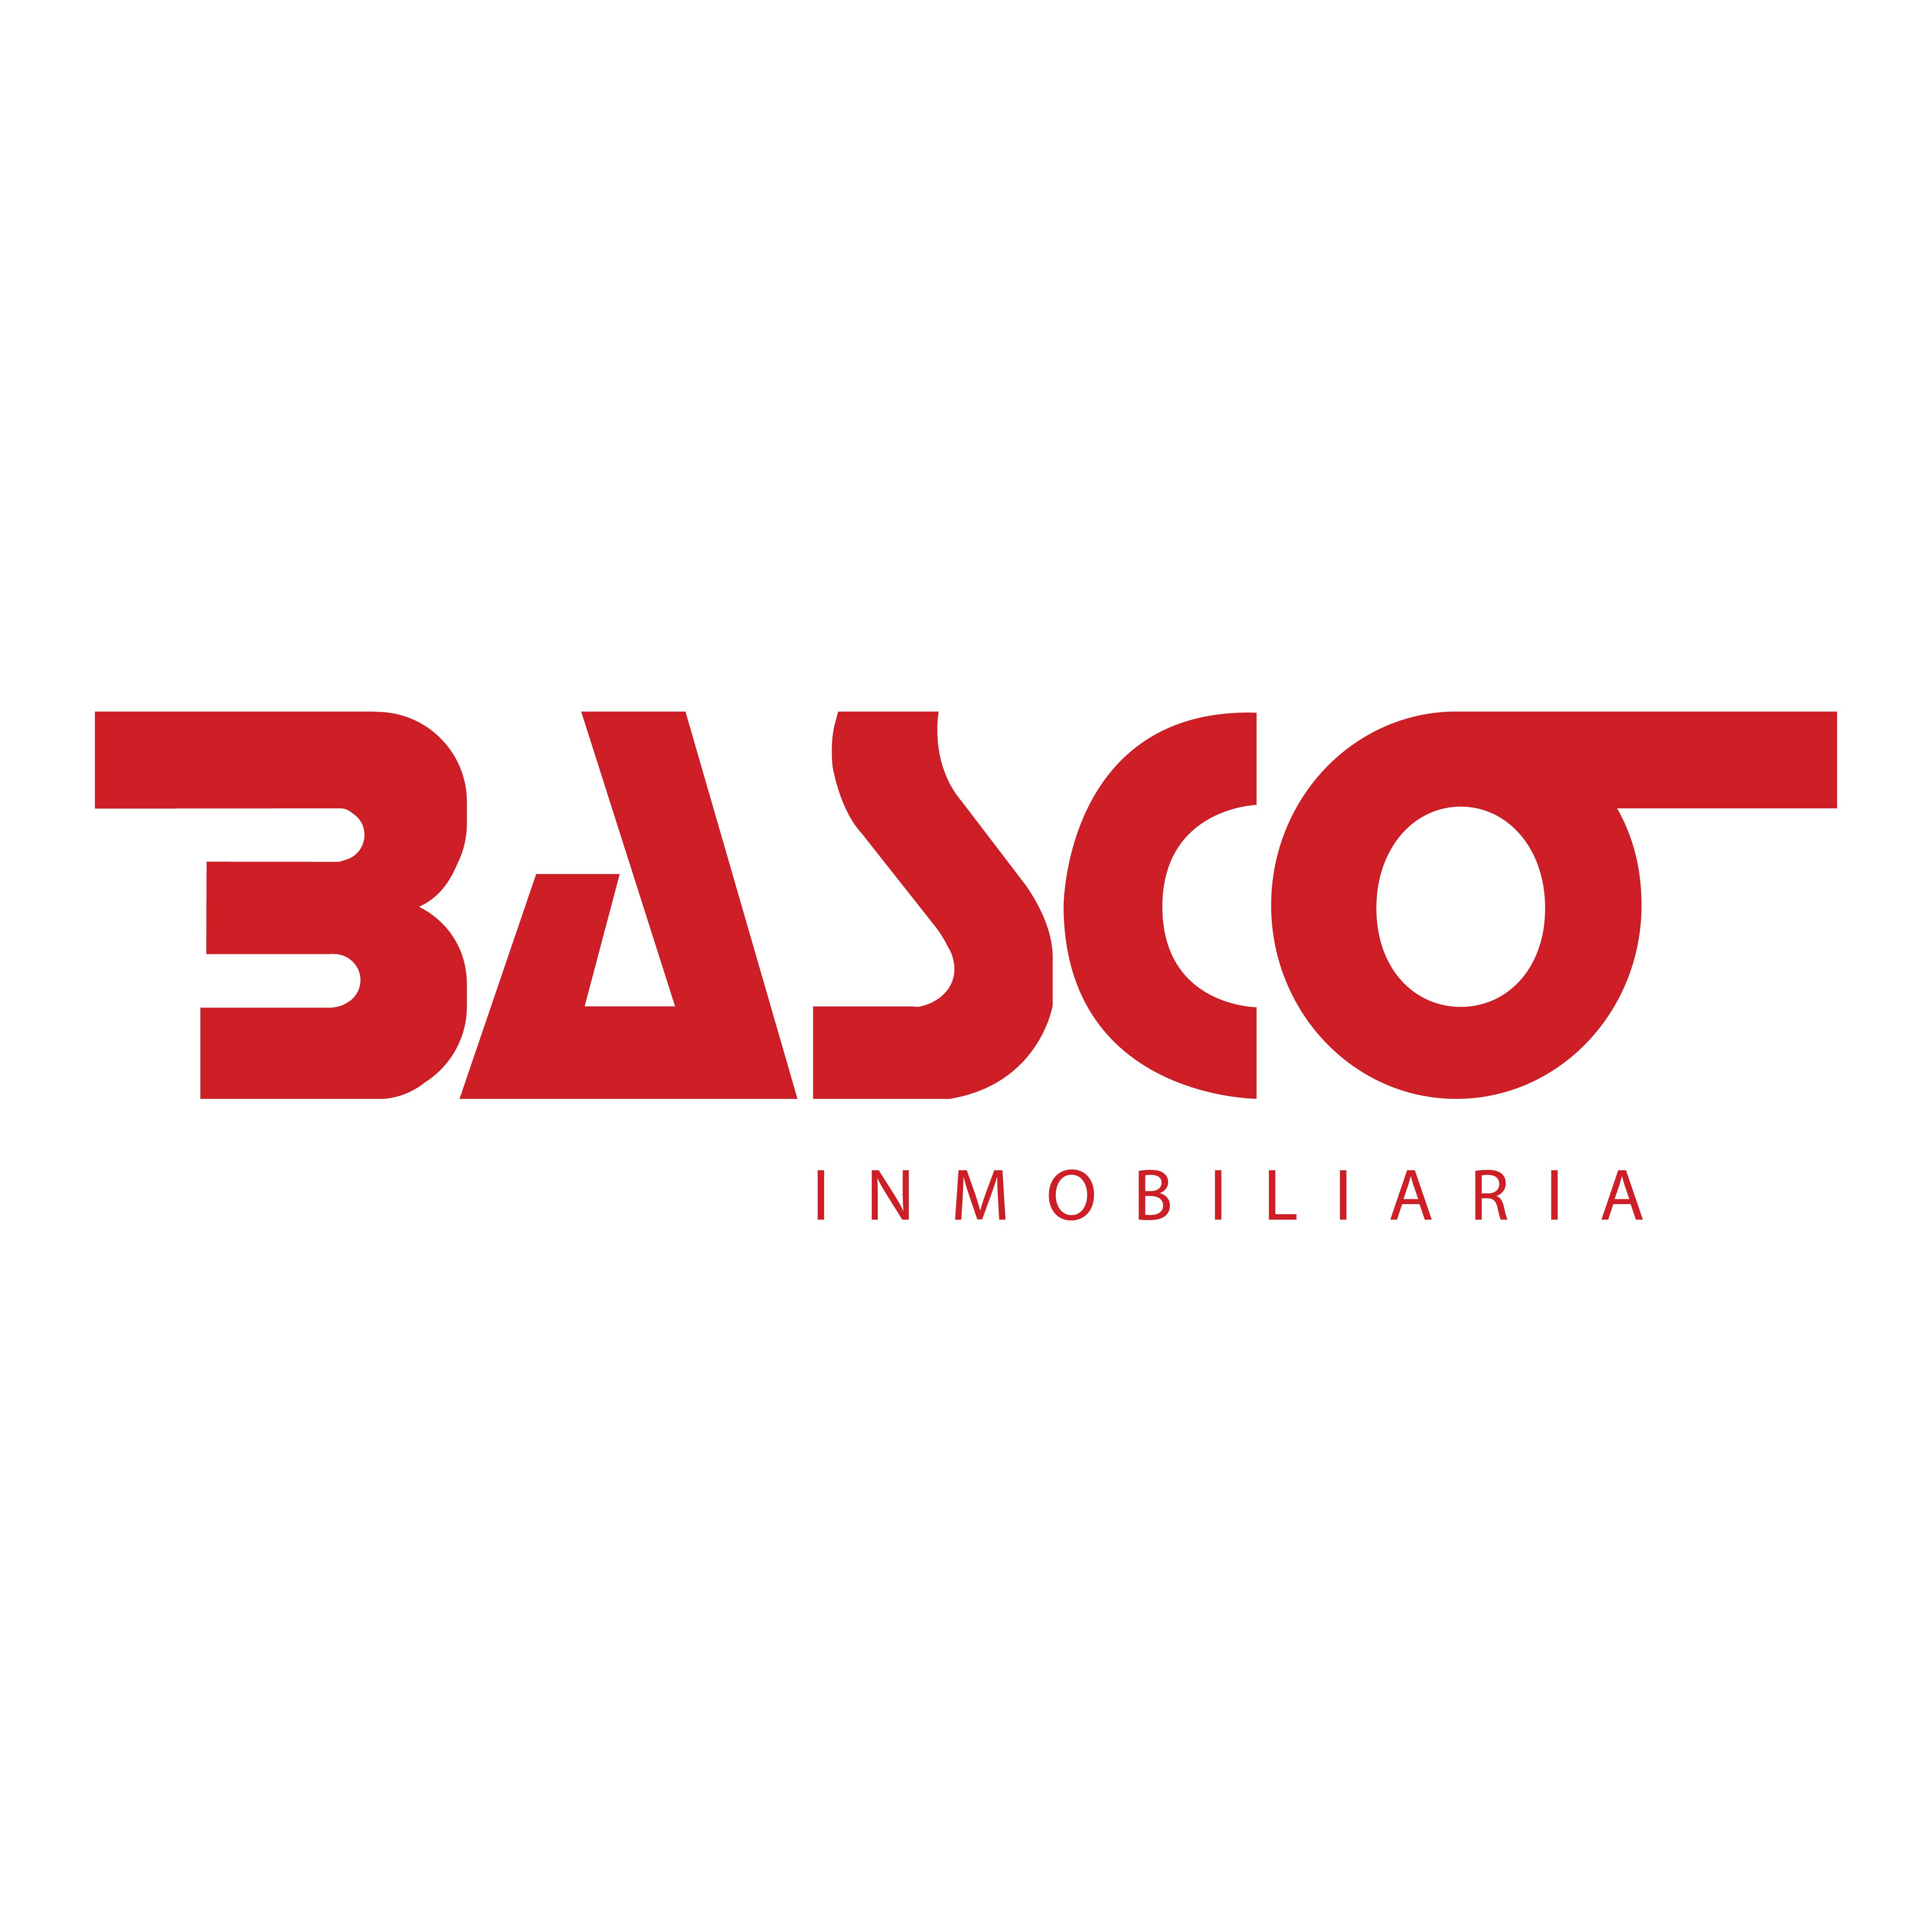 basco-inmobiliaria-ltda